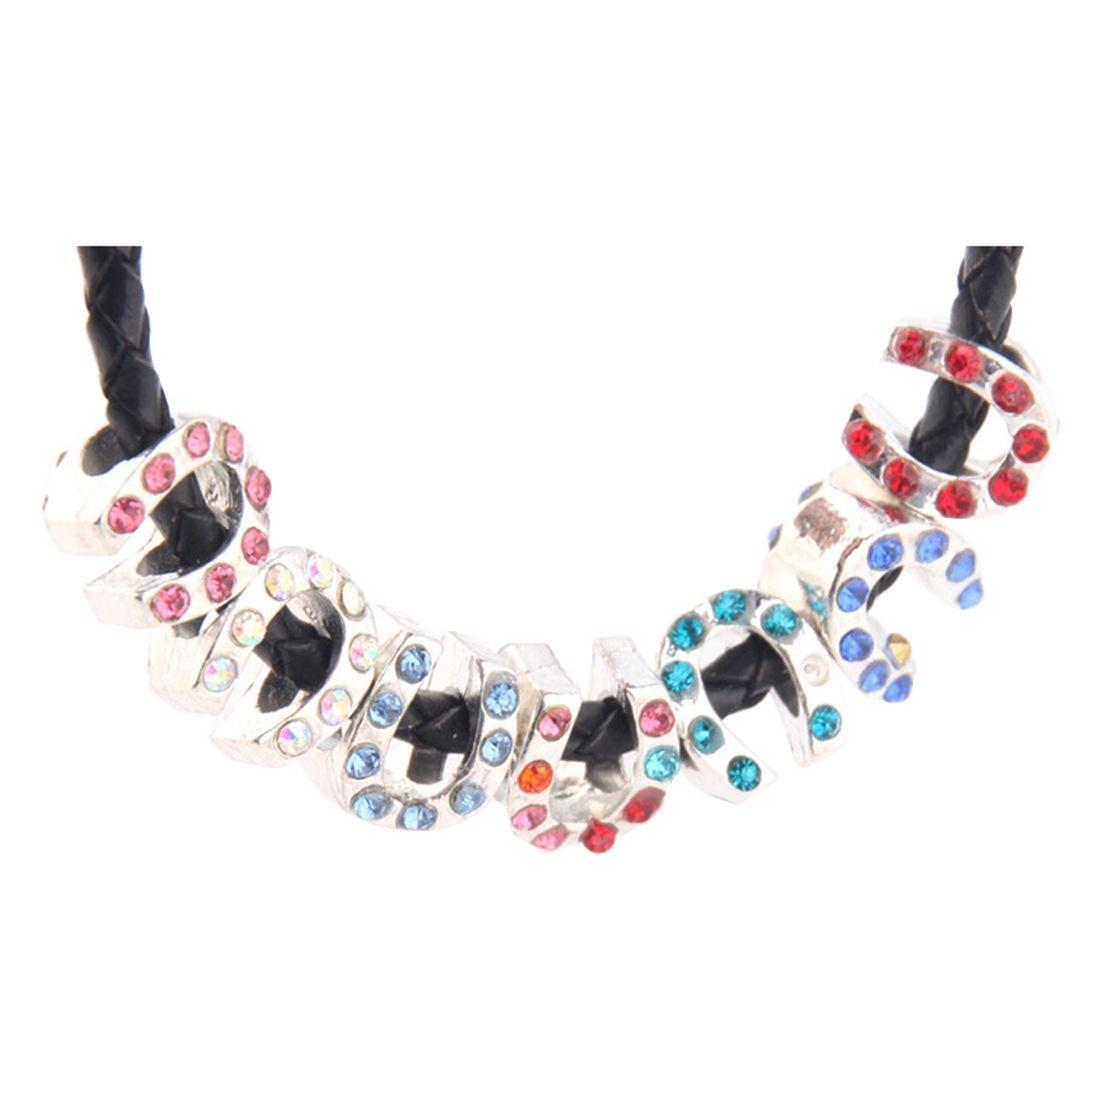 5PCs European Charm Beads Rhinestone Horseshoe 11mm x 9mm